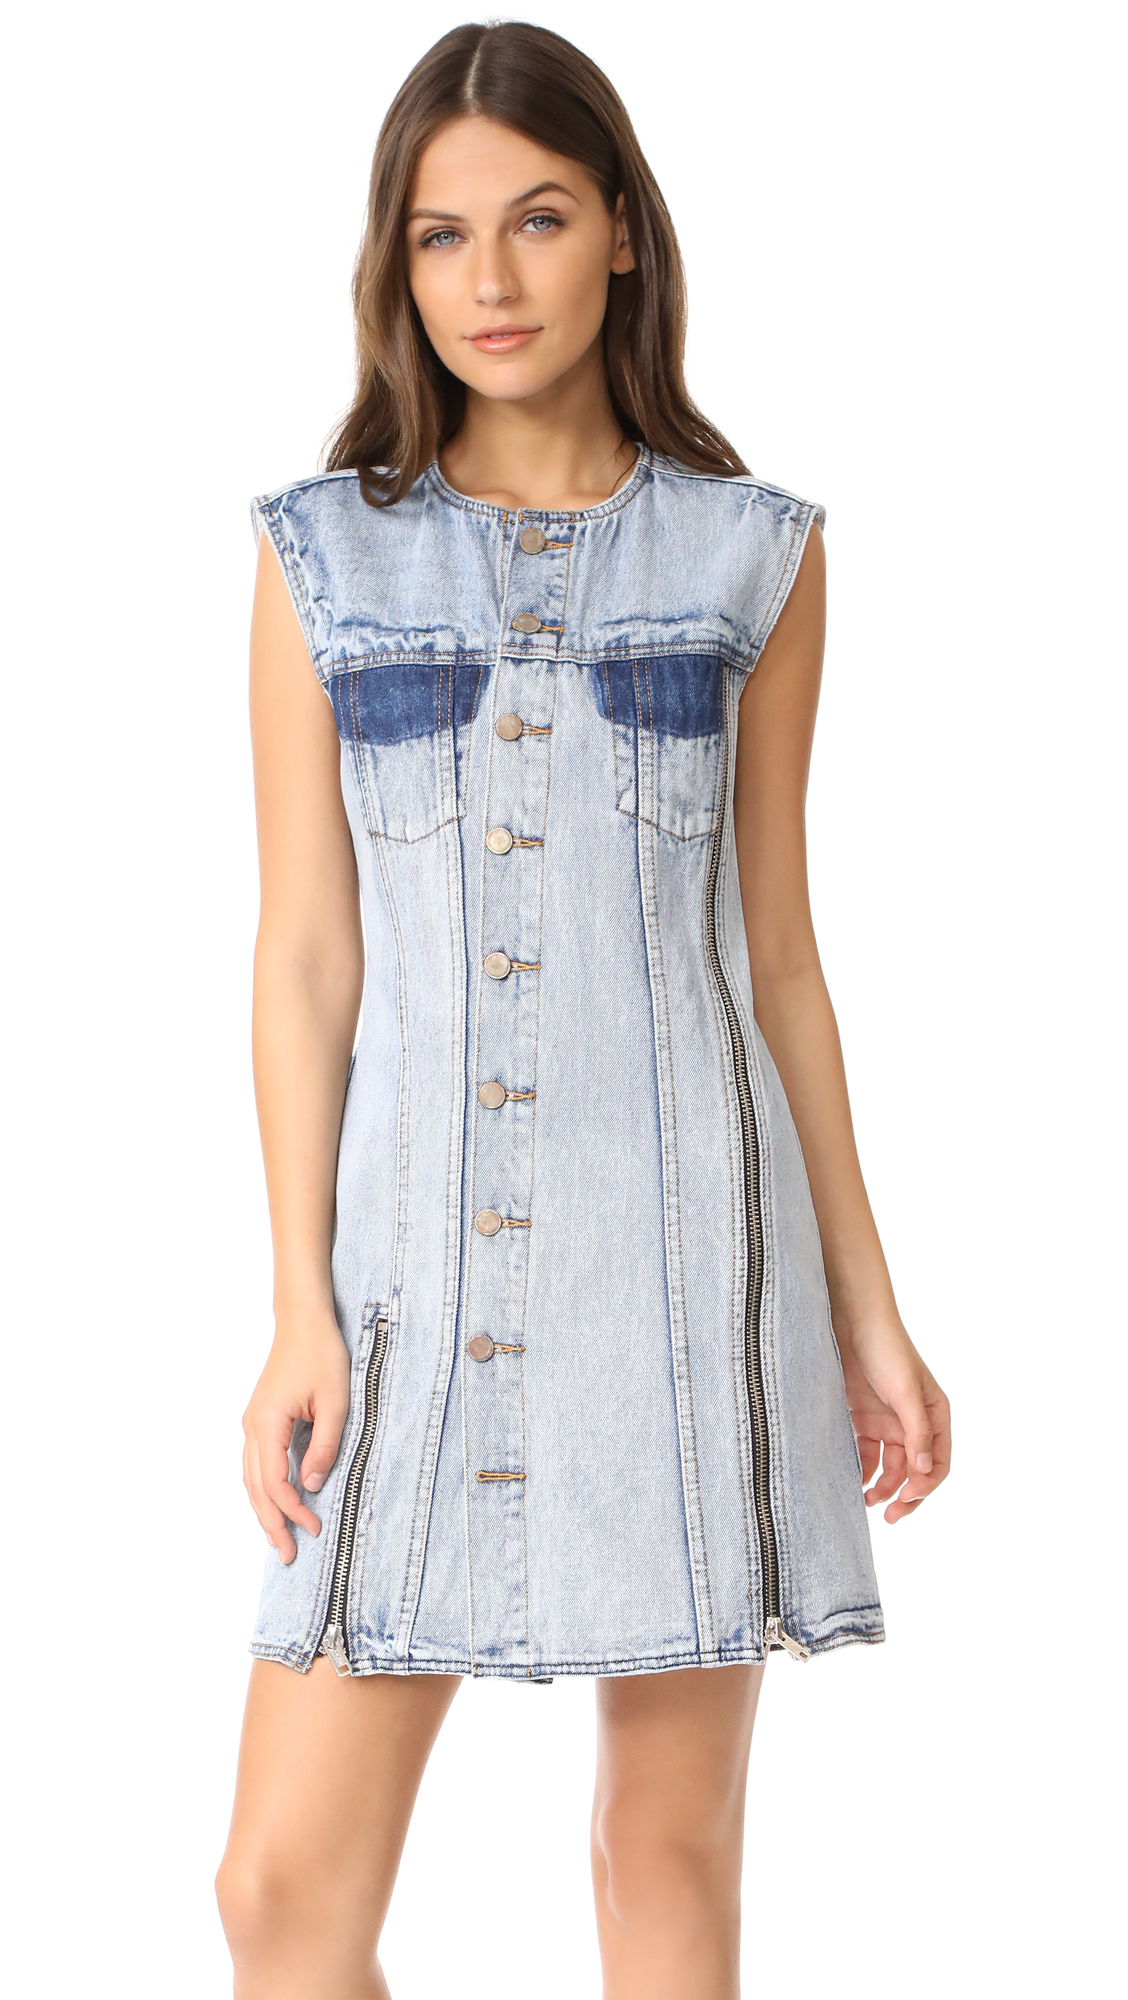 3.1 Phillip Lim Asymmetrical Denim Dress